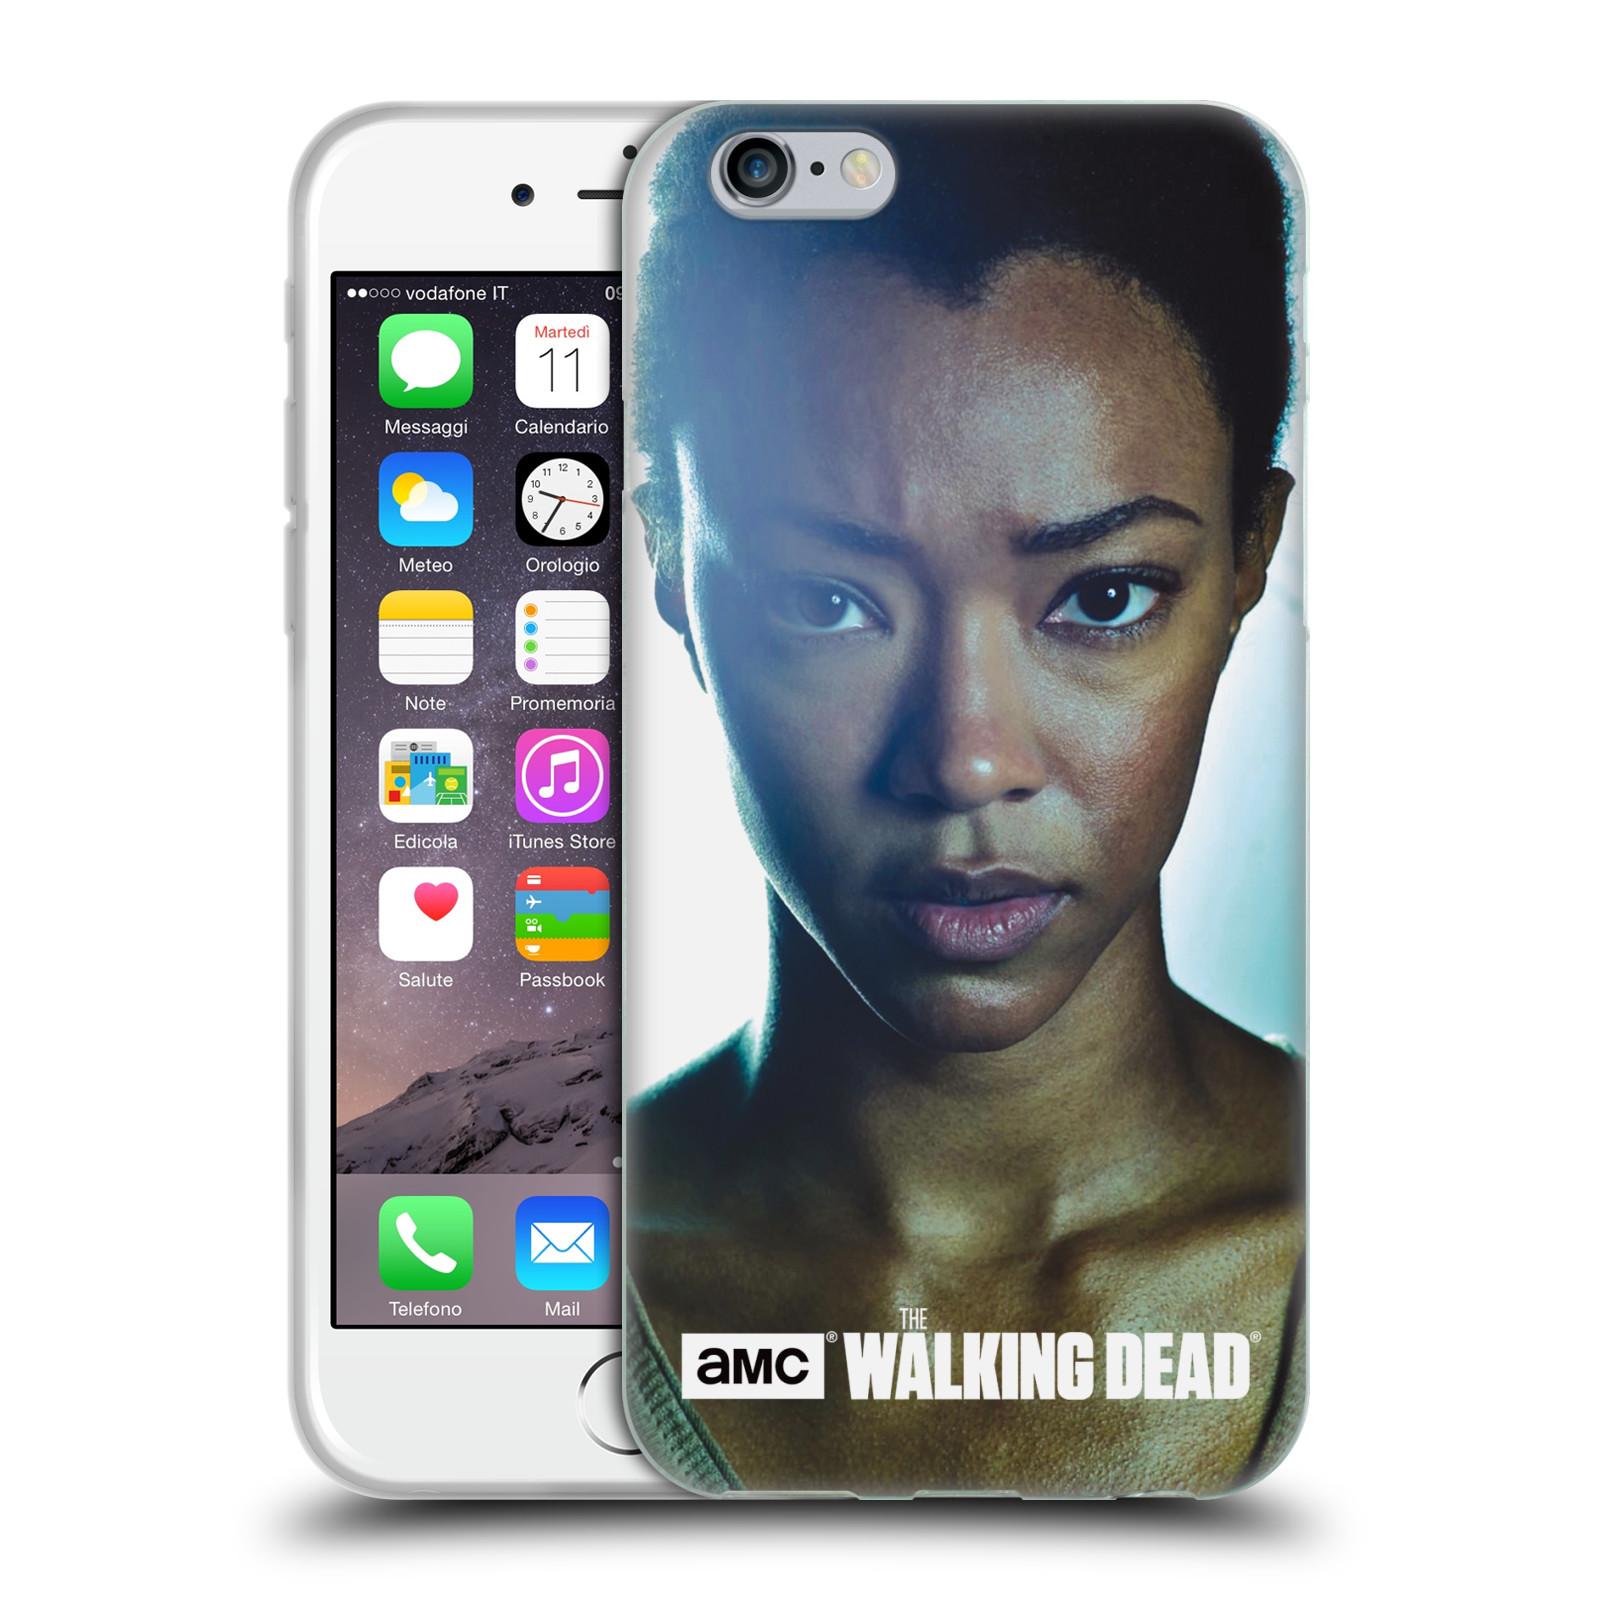 HEAD CASE silikonový obal na mobil Apple Iphone 6 / 6S originální potisk Walking Dead postavy Sasha